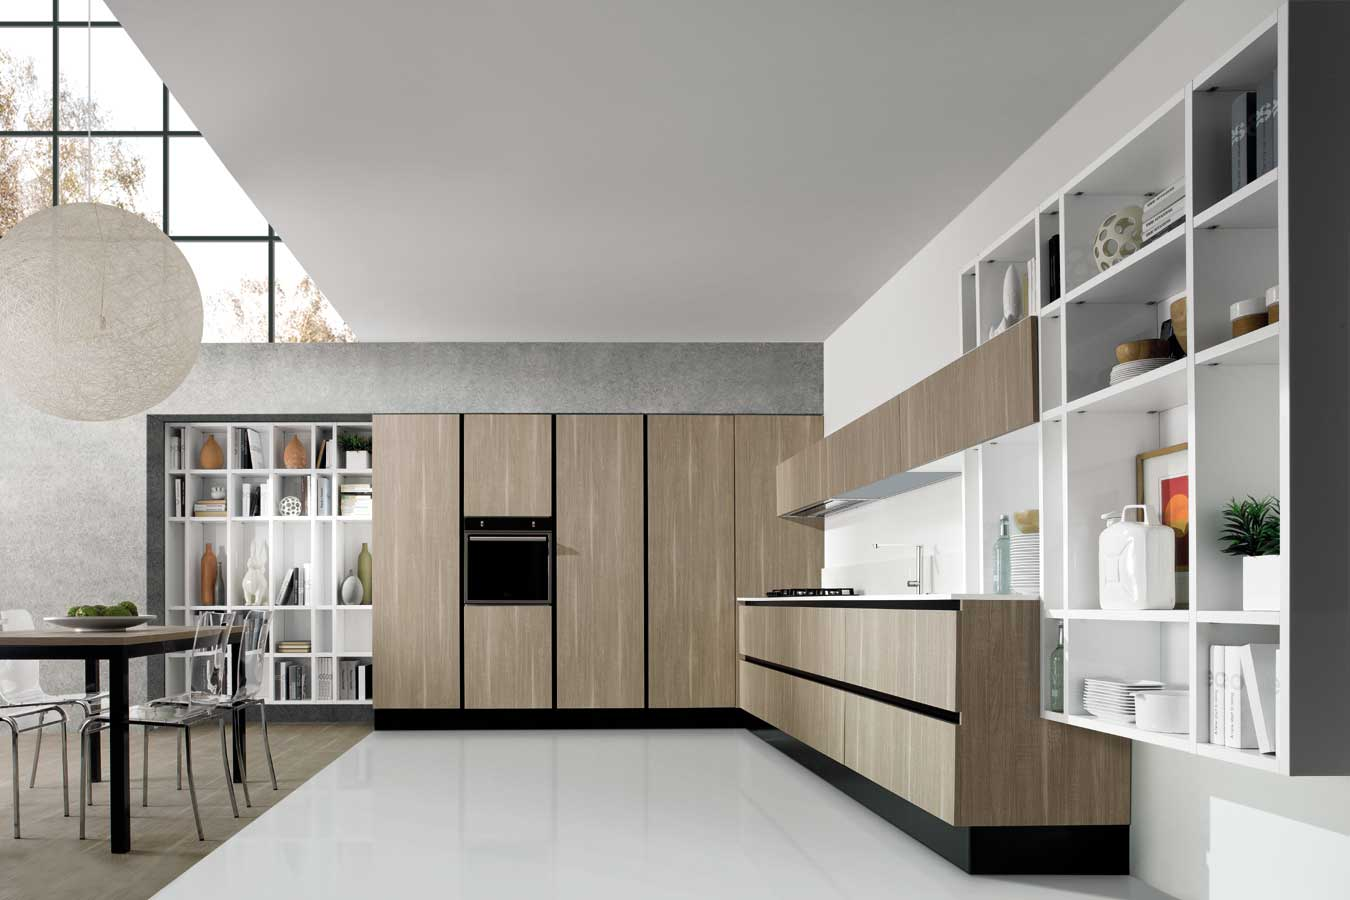 Cucina Legno E Bianco cucina-legno-bianco-erika-aran - righetti mobili novara